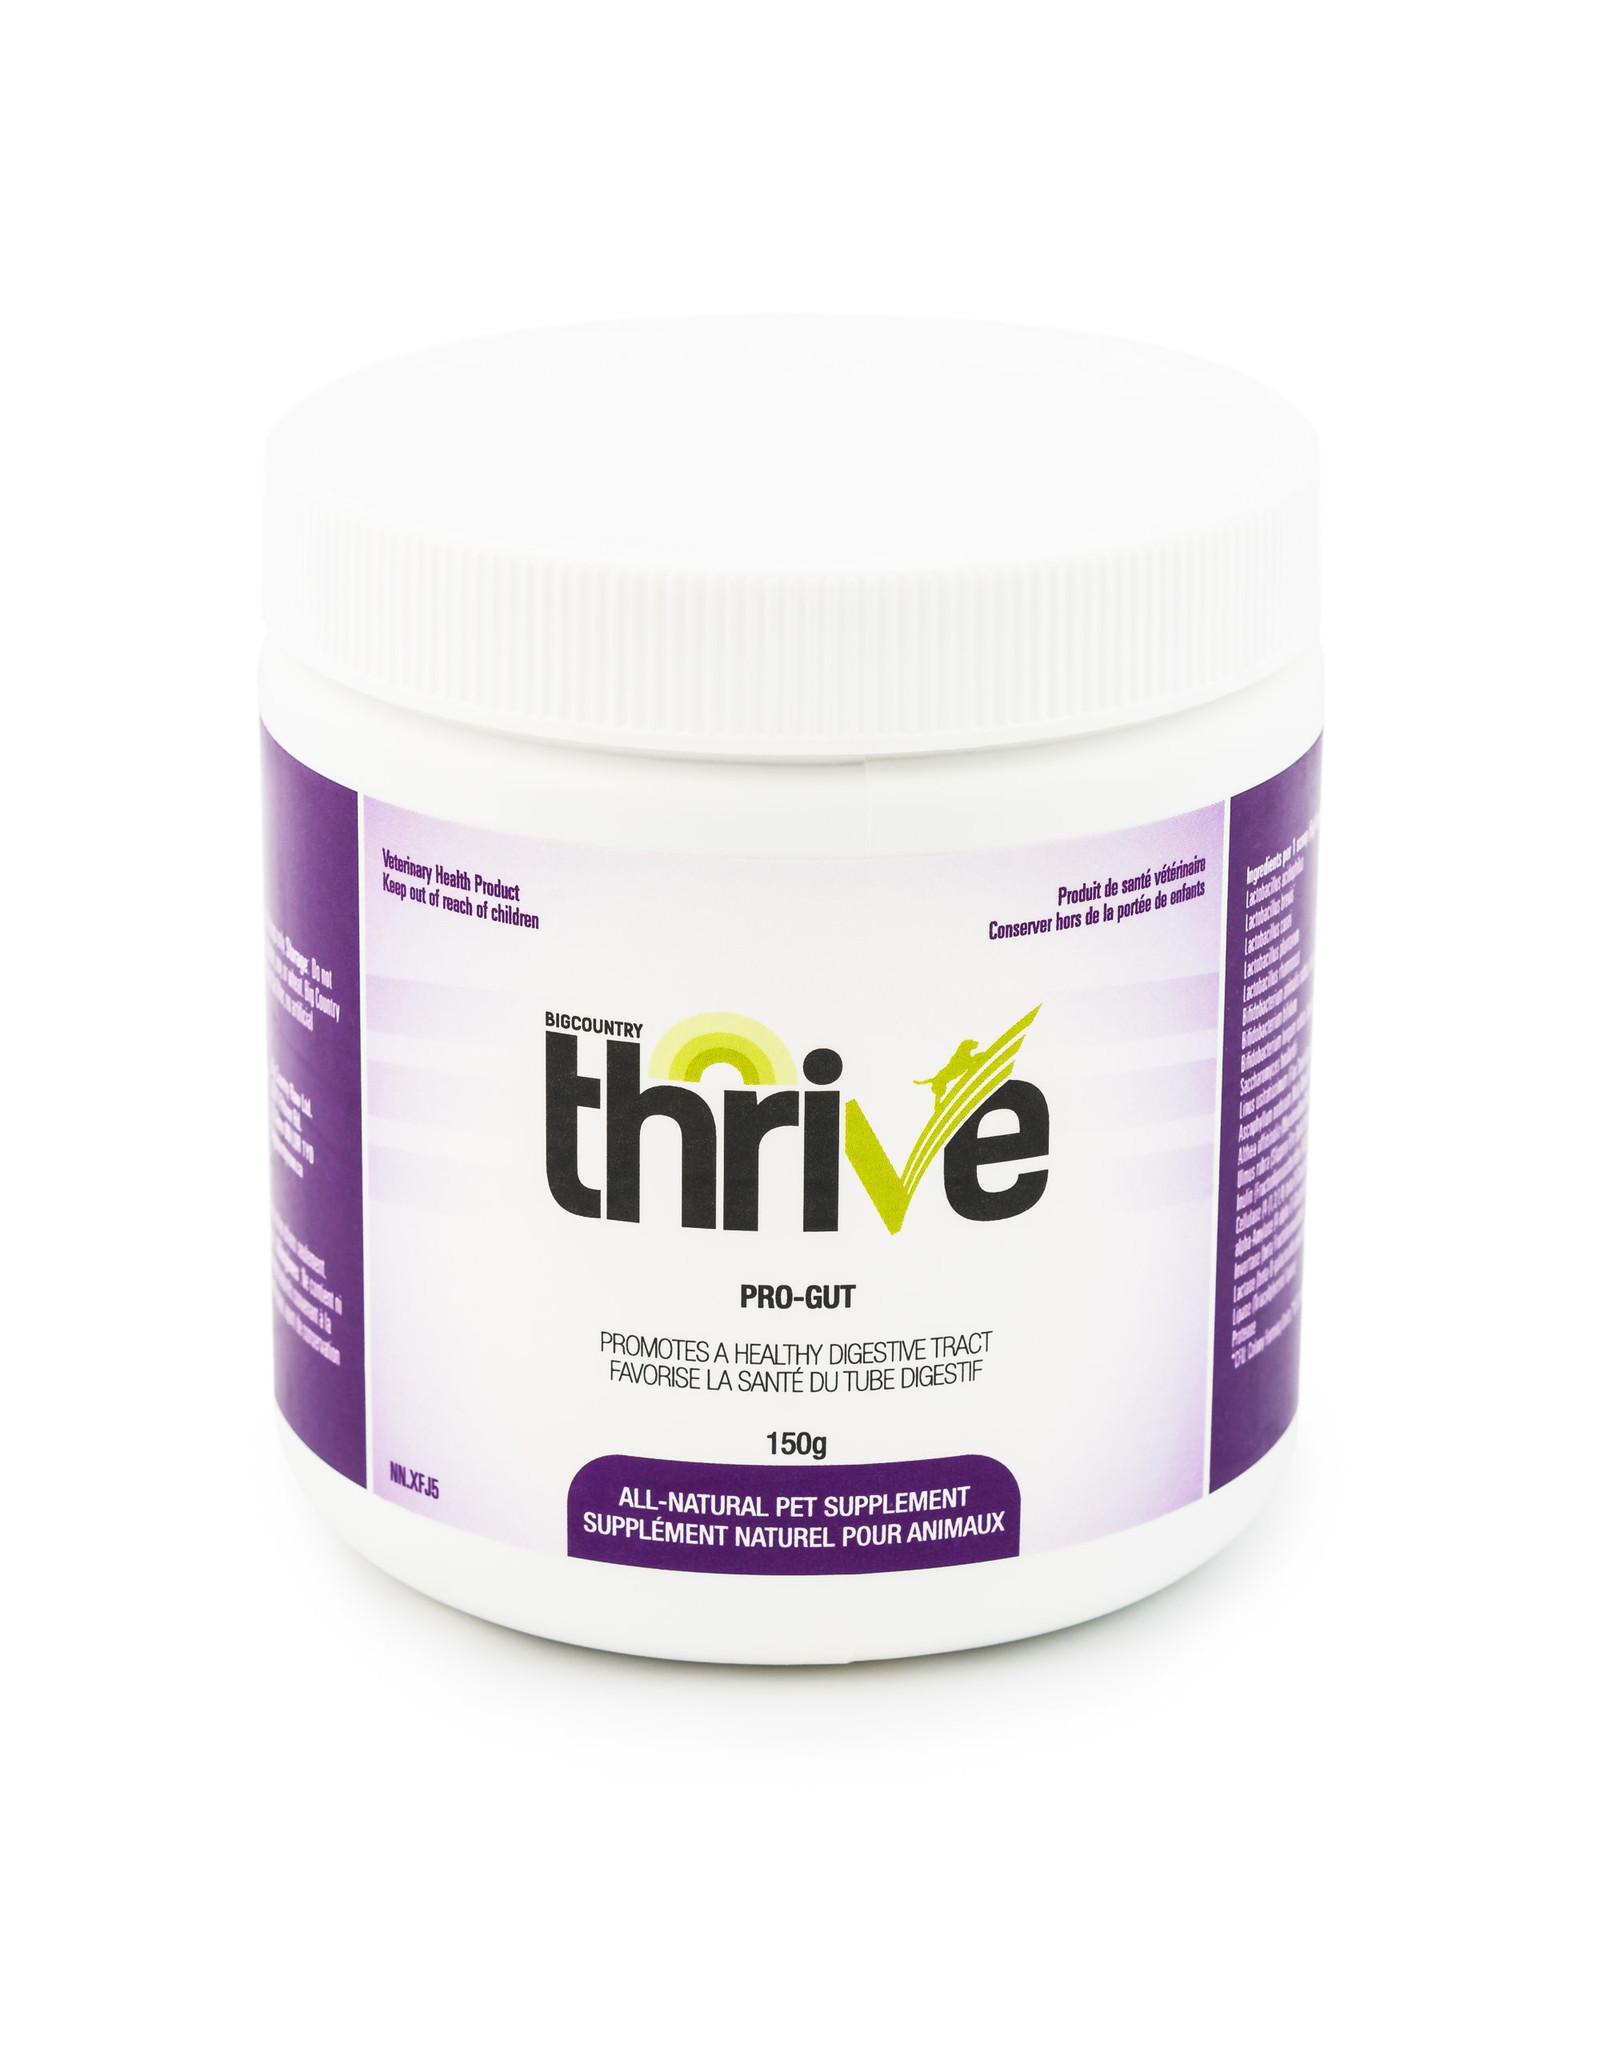 Thrive ProGut Dog & Cat Supplement Image